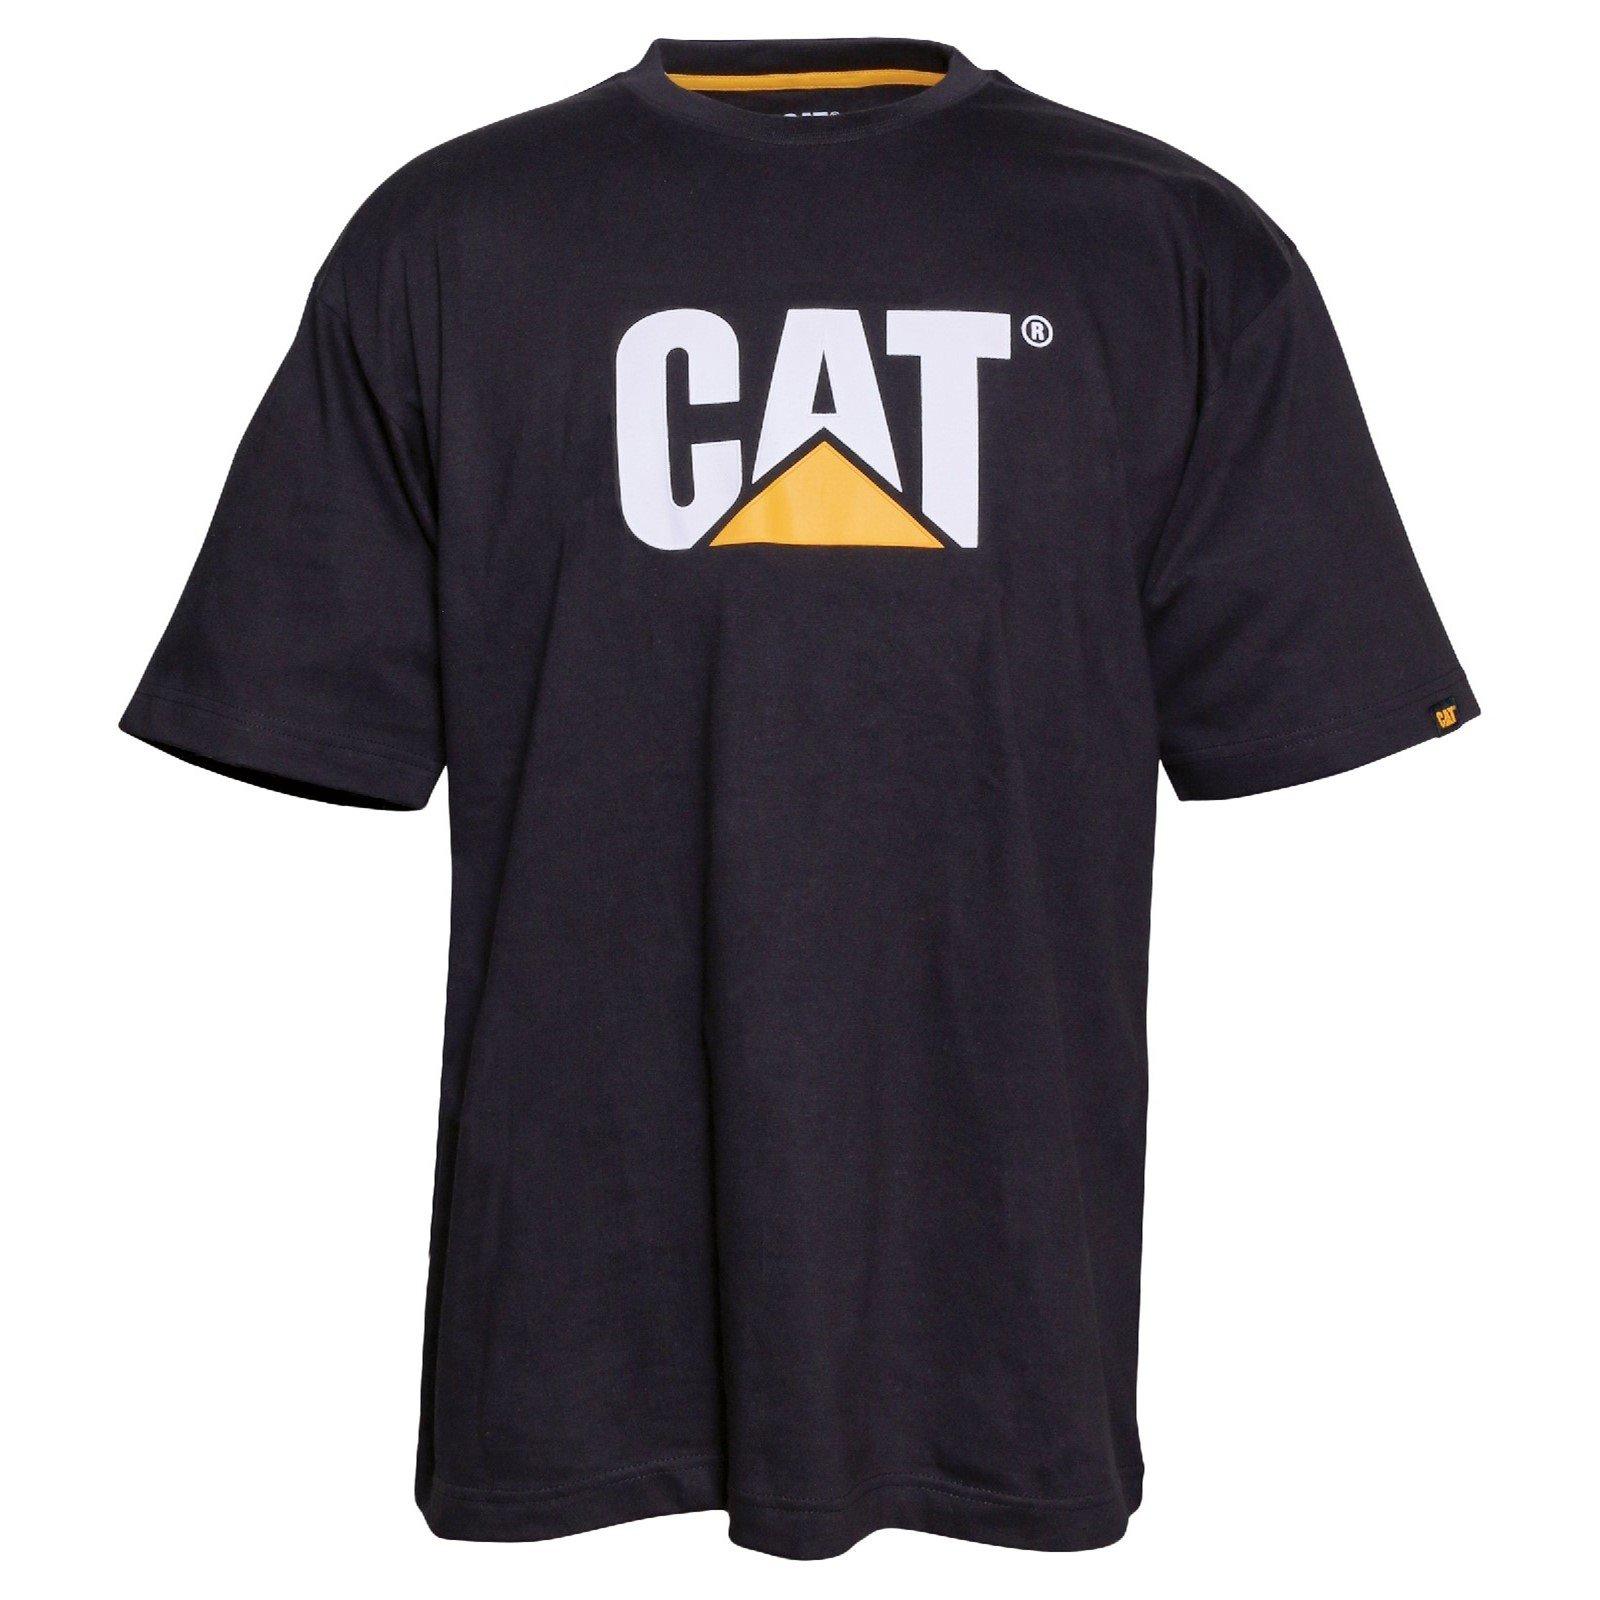 Caterpillar Men's Trademark Logo T-Shirt Various Colours 25301-42086 - Black Med